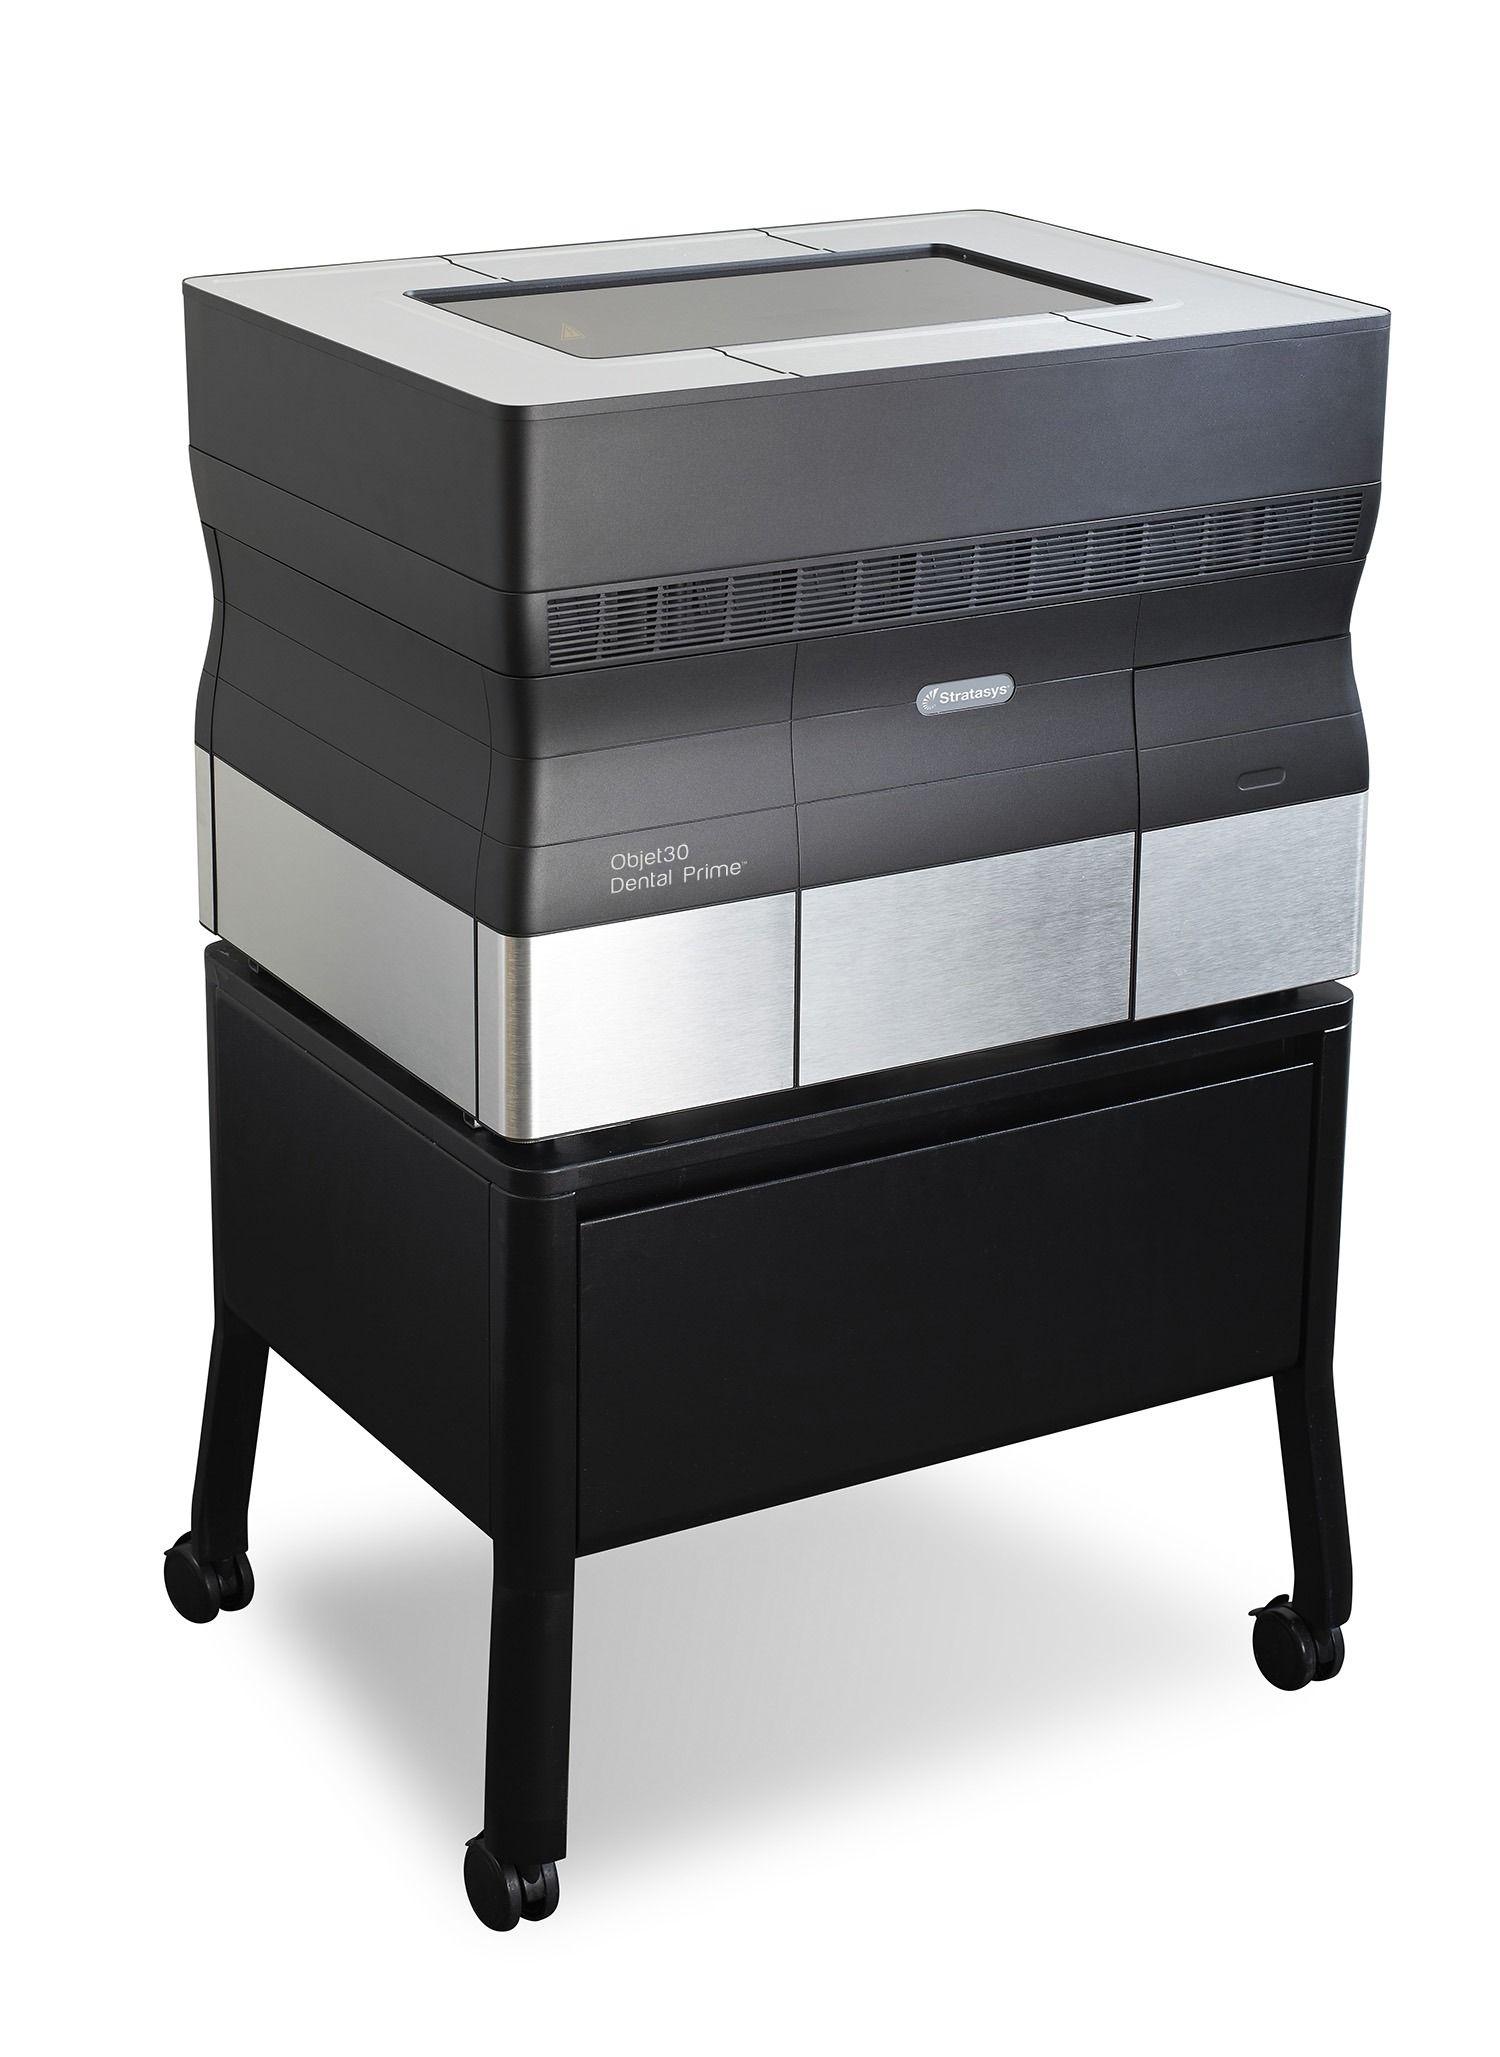 Impressora 3D Objet30 Prime